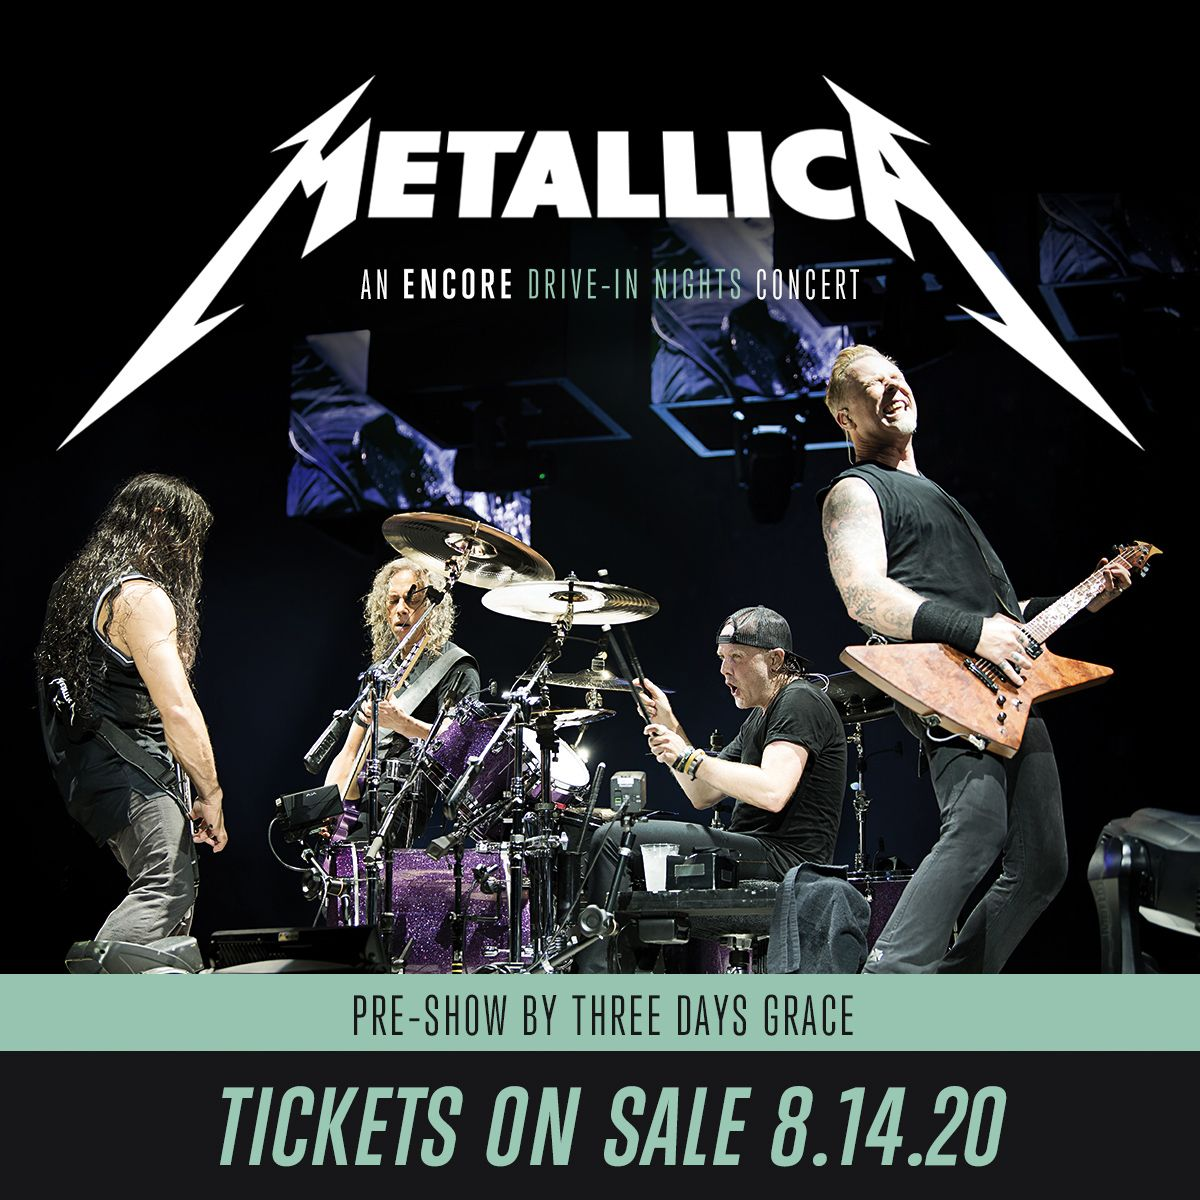 Announce Metallica Square 1080x1080 copy.jpg